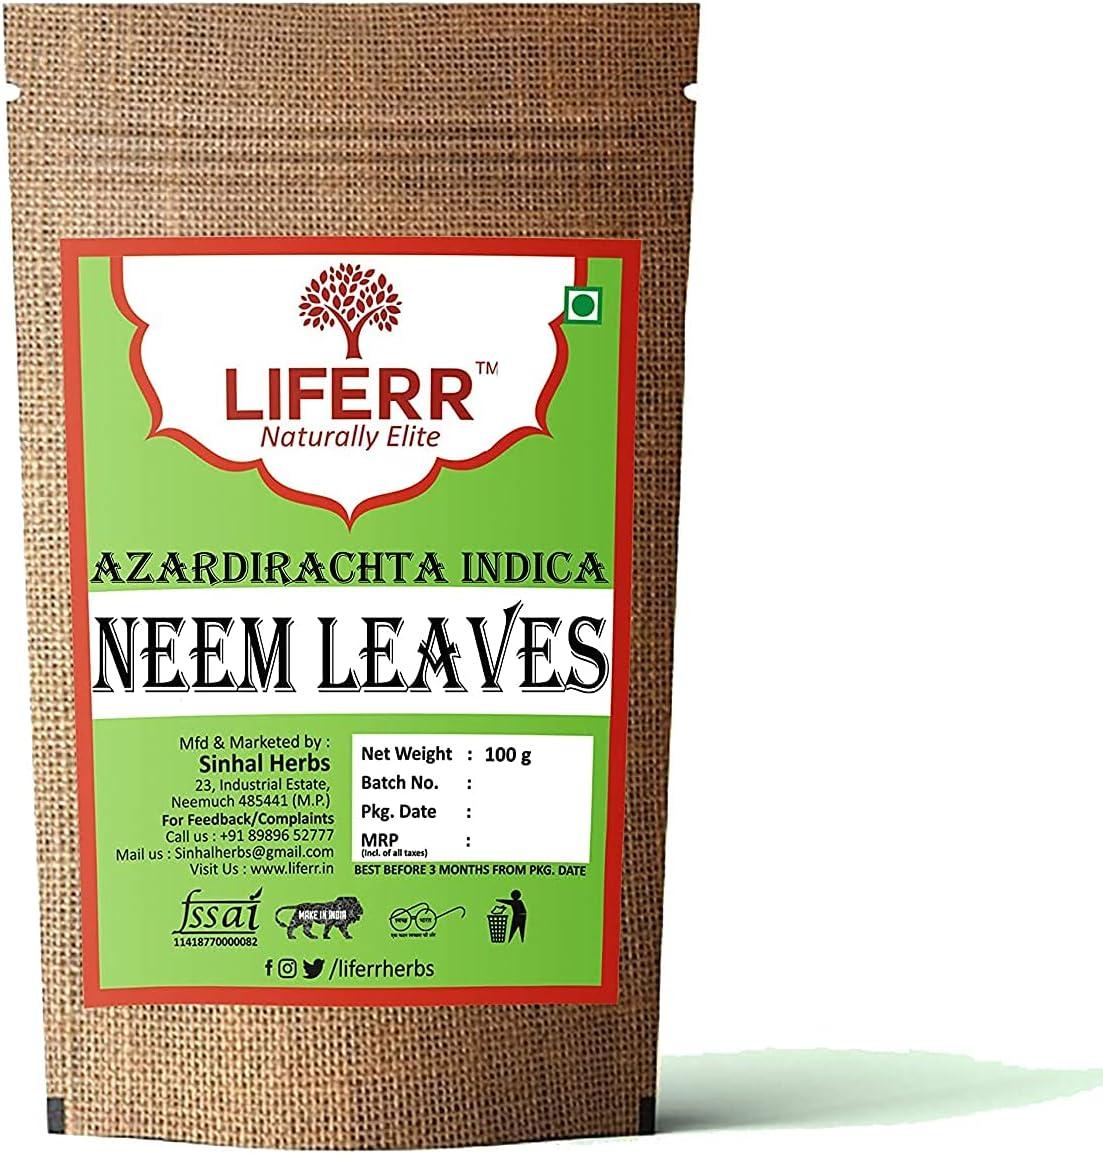 Lendom LIFERR Challenge the lowest price Neem Leaves online shopping Gm 100